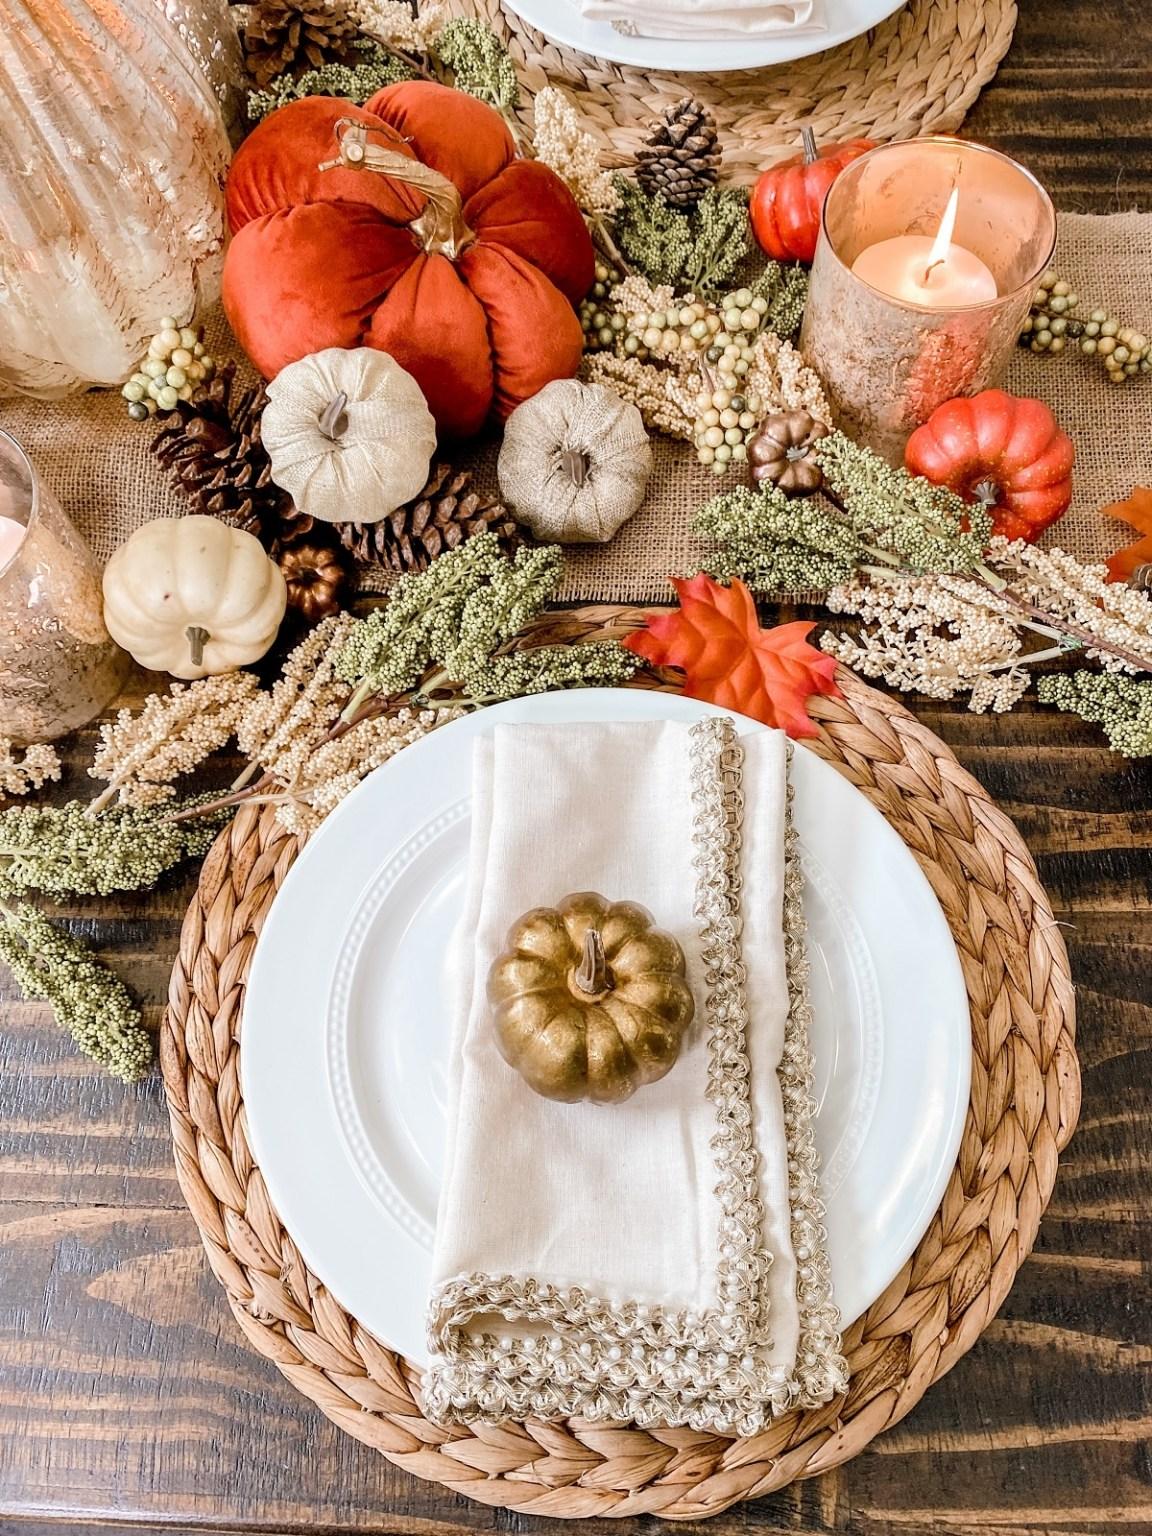 Savilla Mountain's splendid fall tablescape